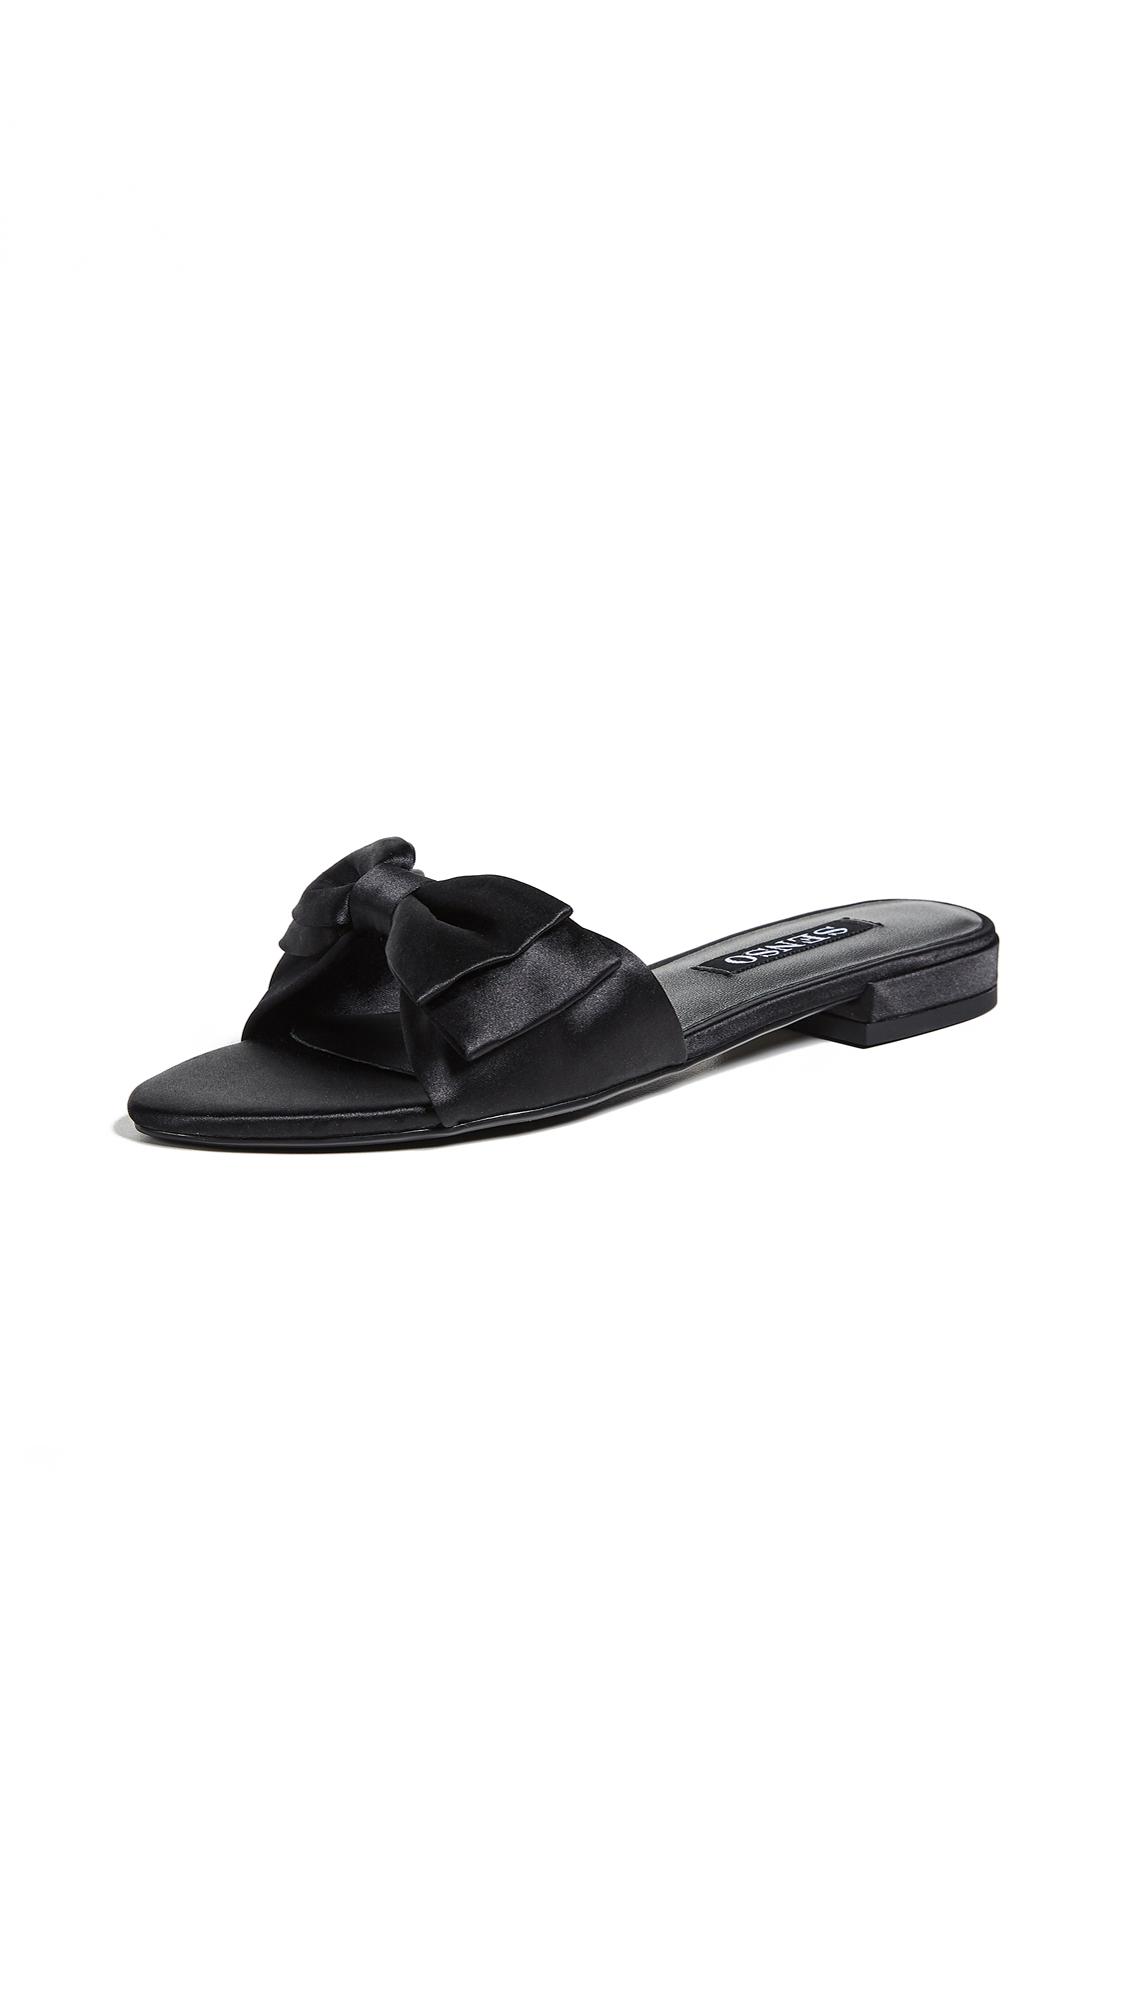 SENSO Zilda Bow Slides - Black